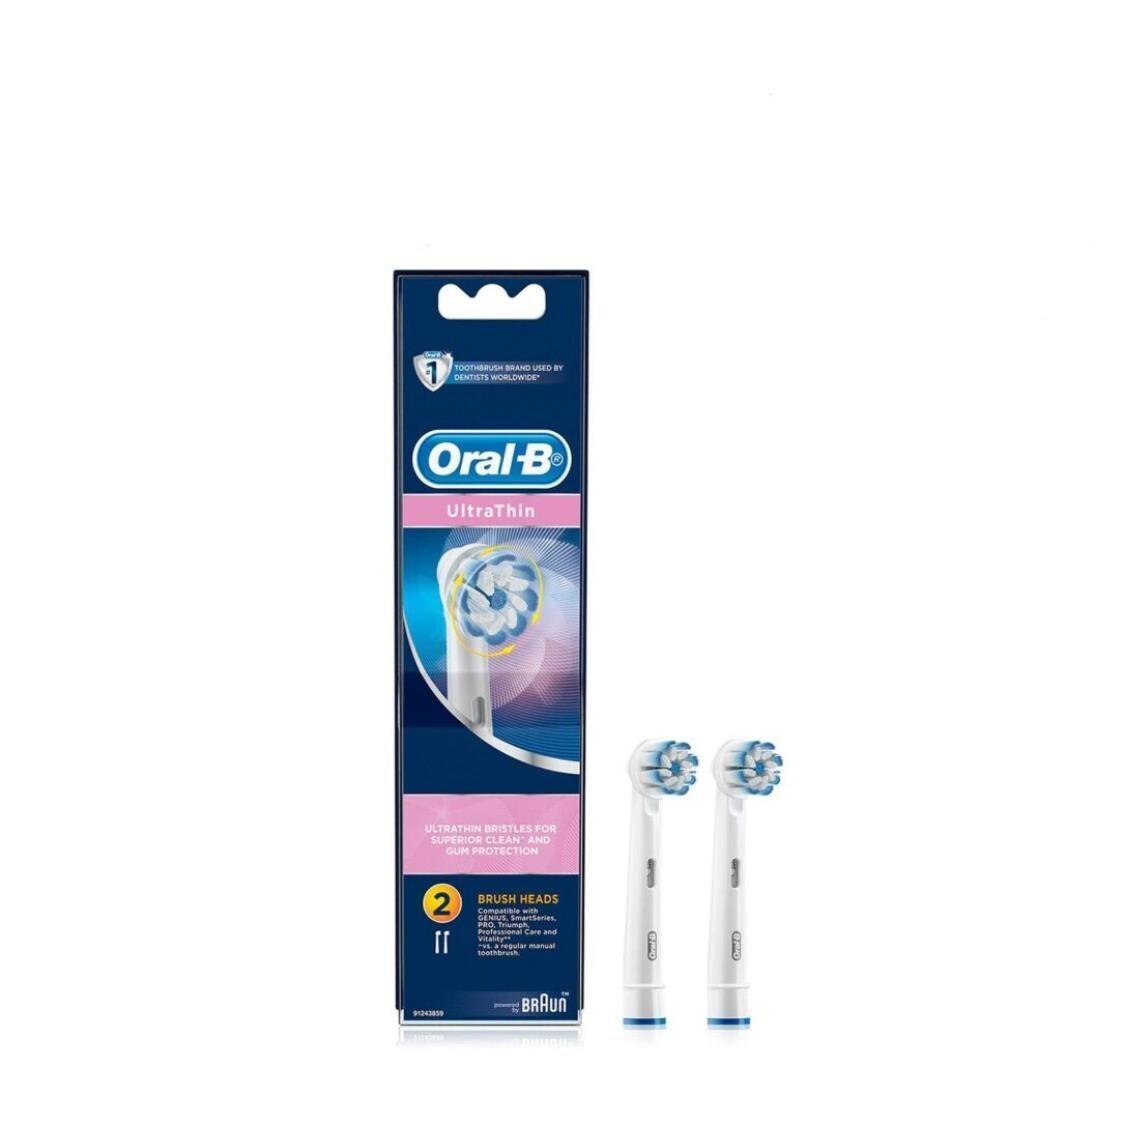 Braun Oral-B Ultra Thin Refill 2s